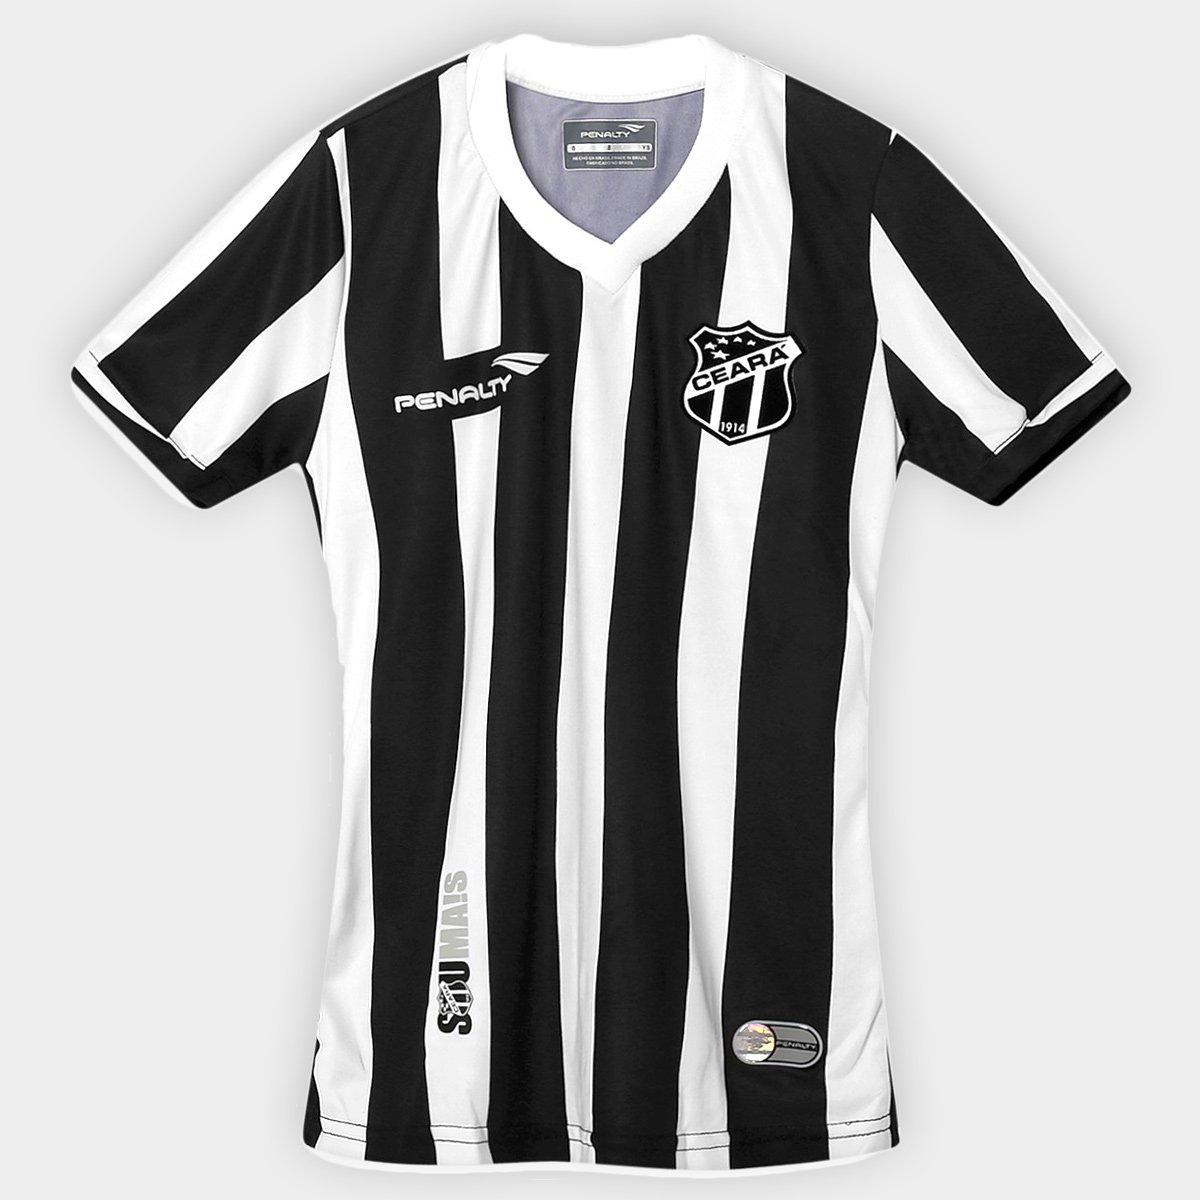 77eab5bdf2 Camisa Ceará Juvenil I 2015 nº 10 - Torcedor Penalty - Compre Agora ...